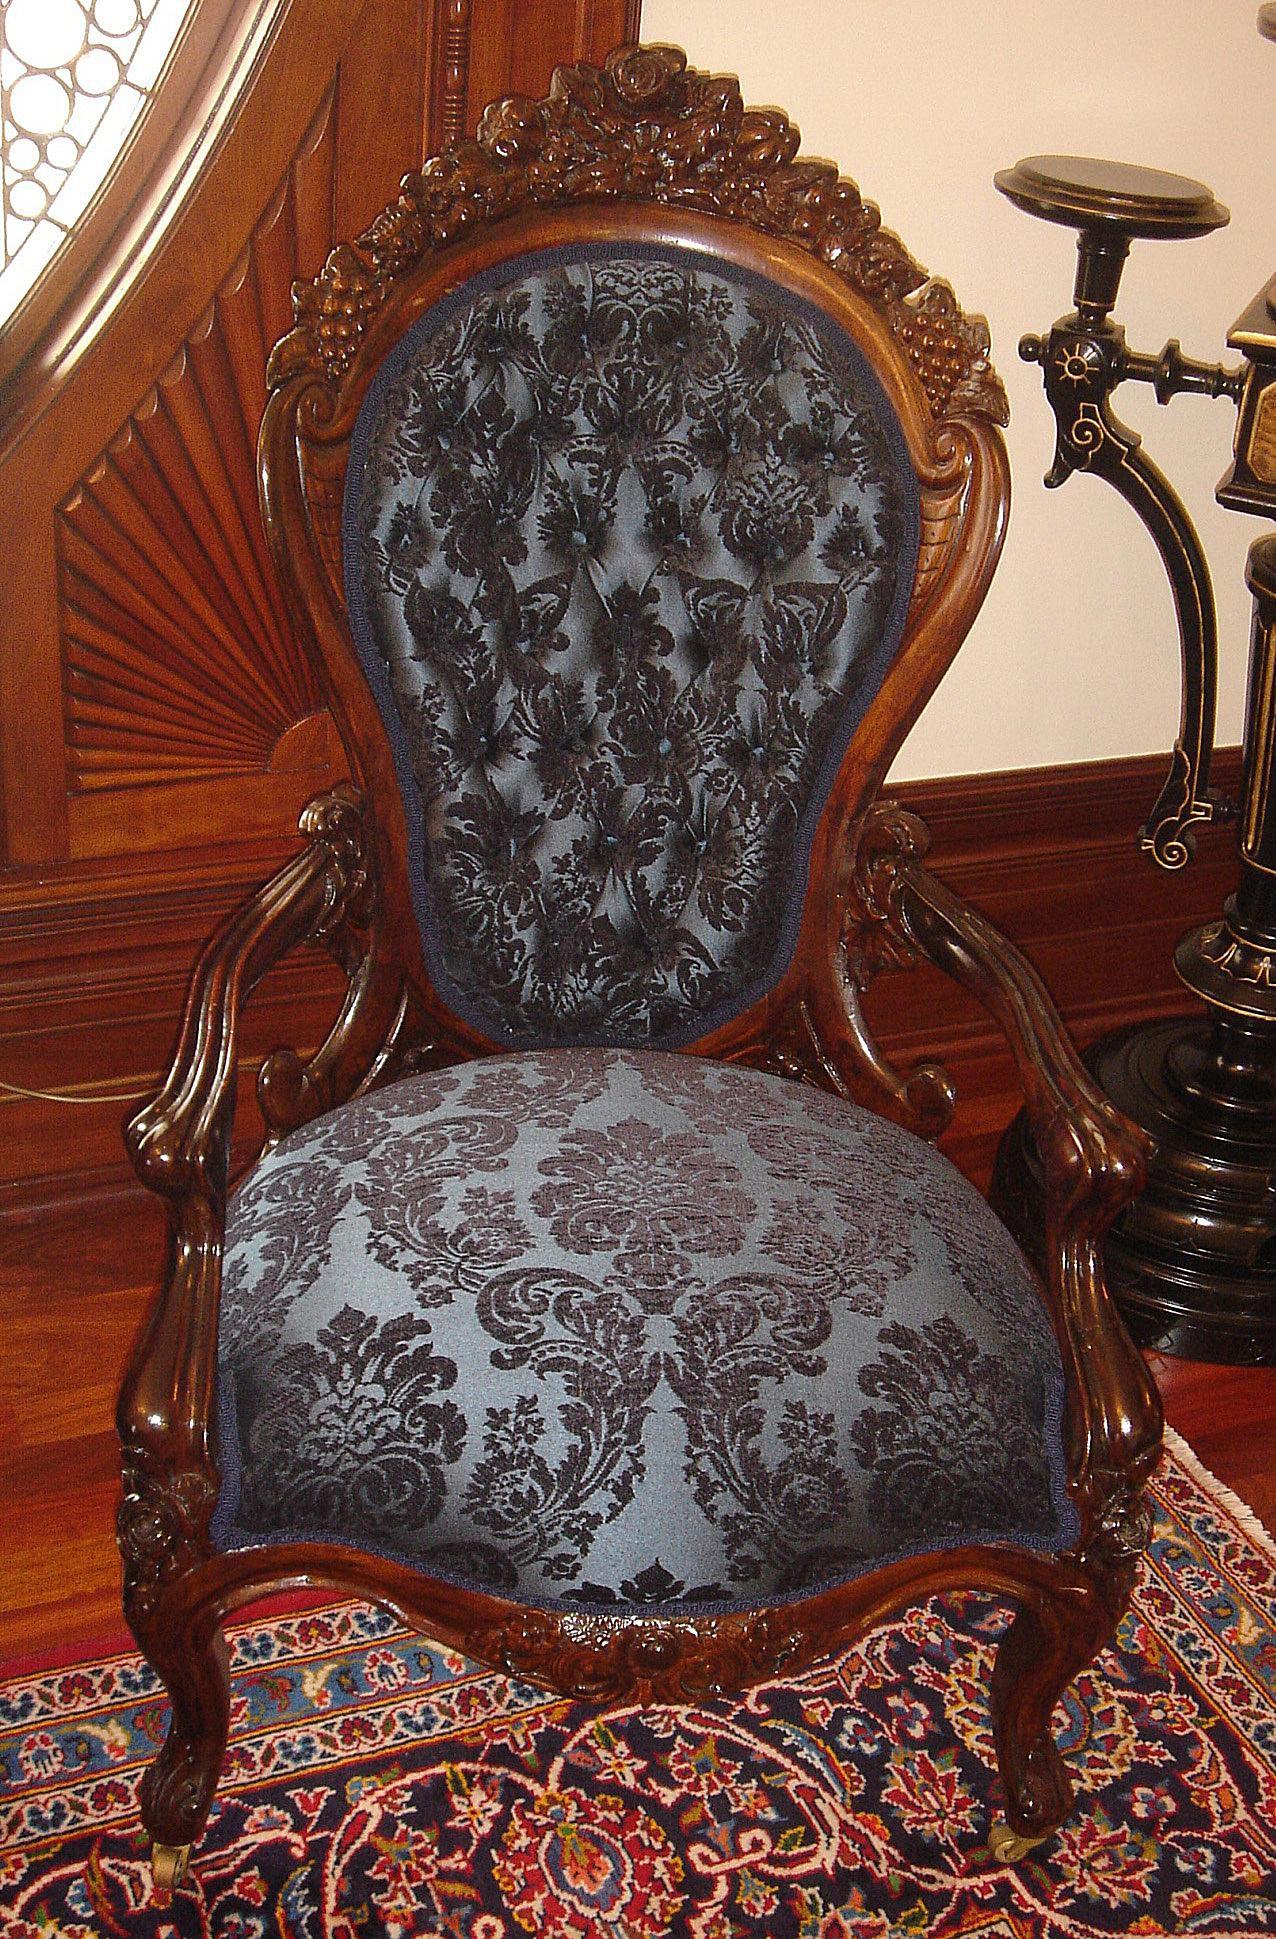 John Henry Belter Rococo Revival Furniture Master